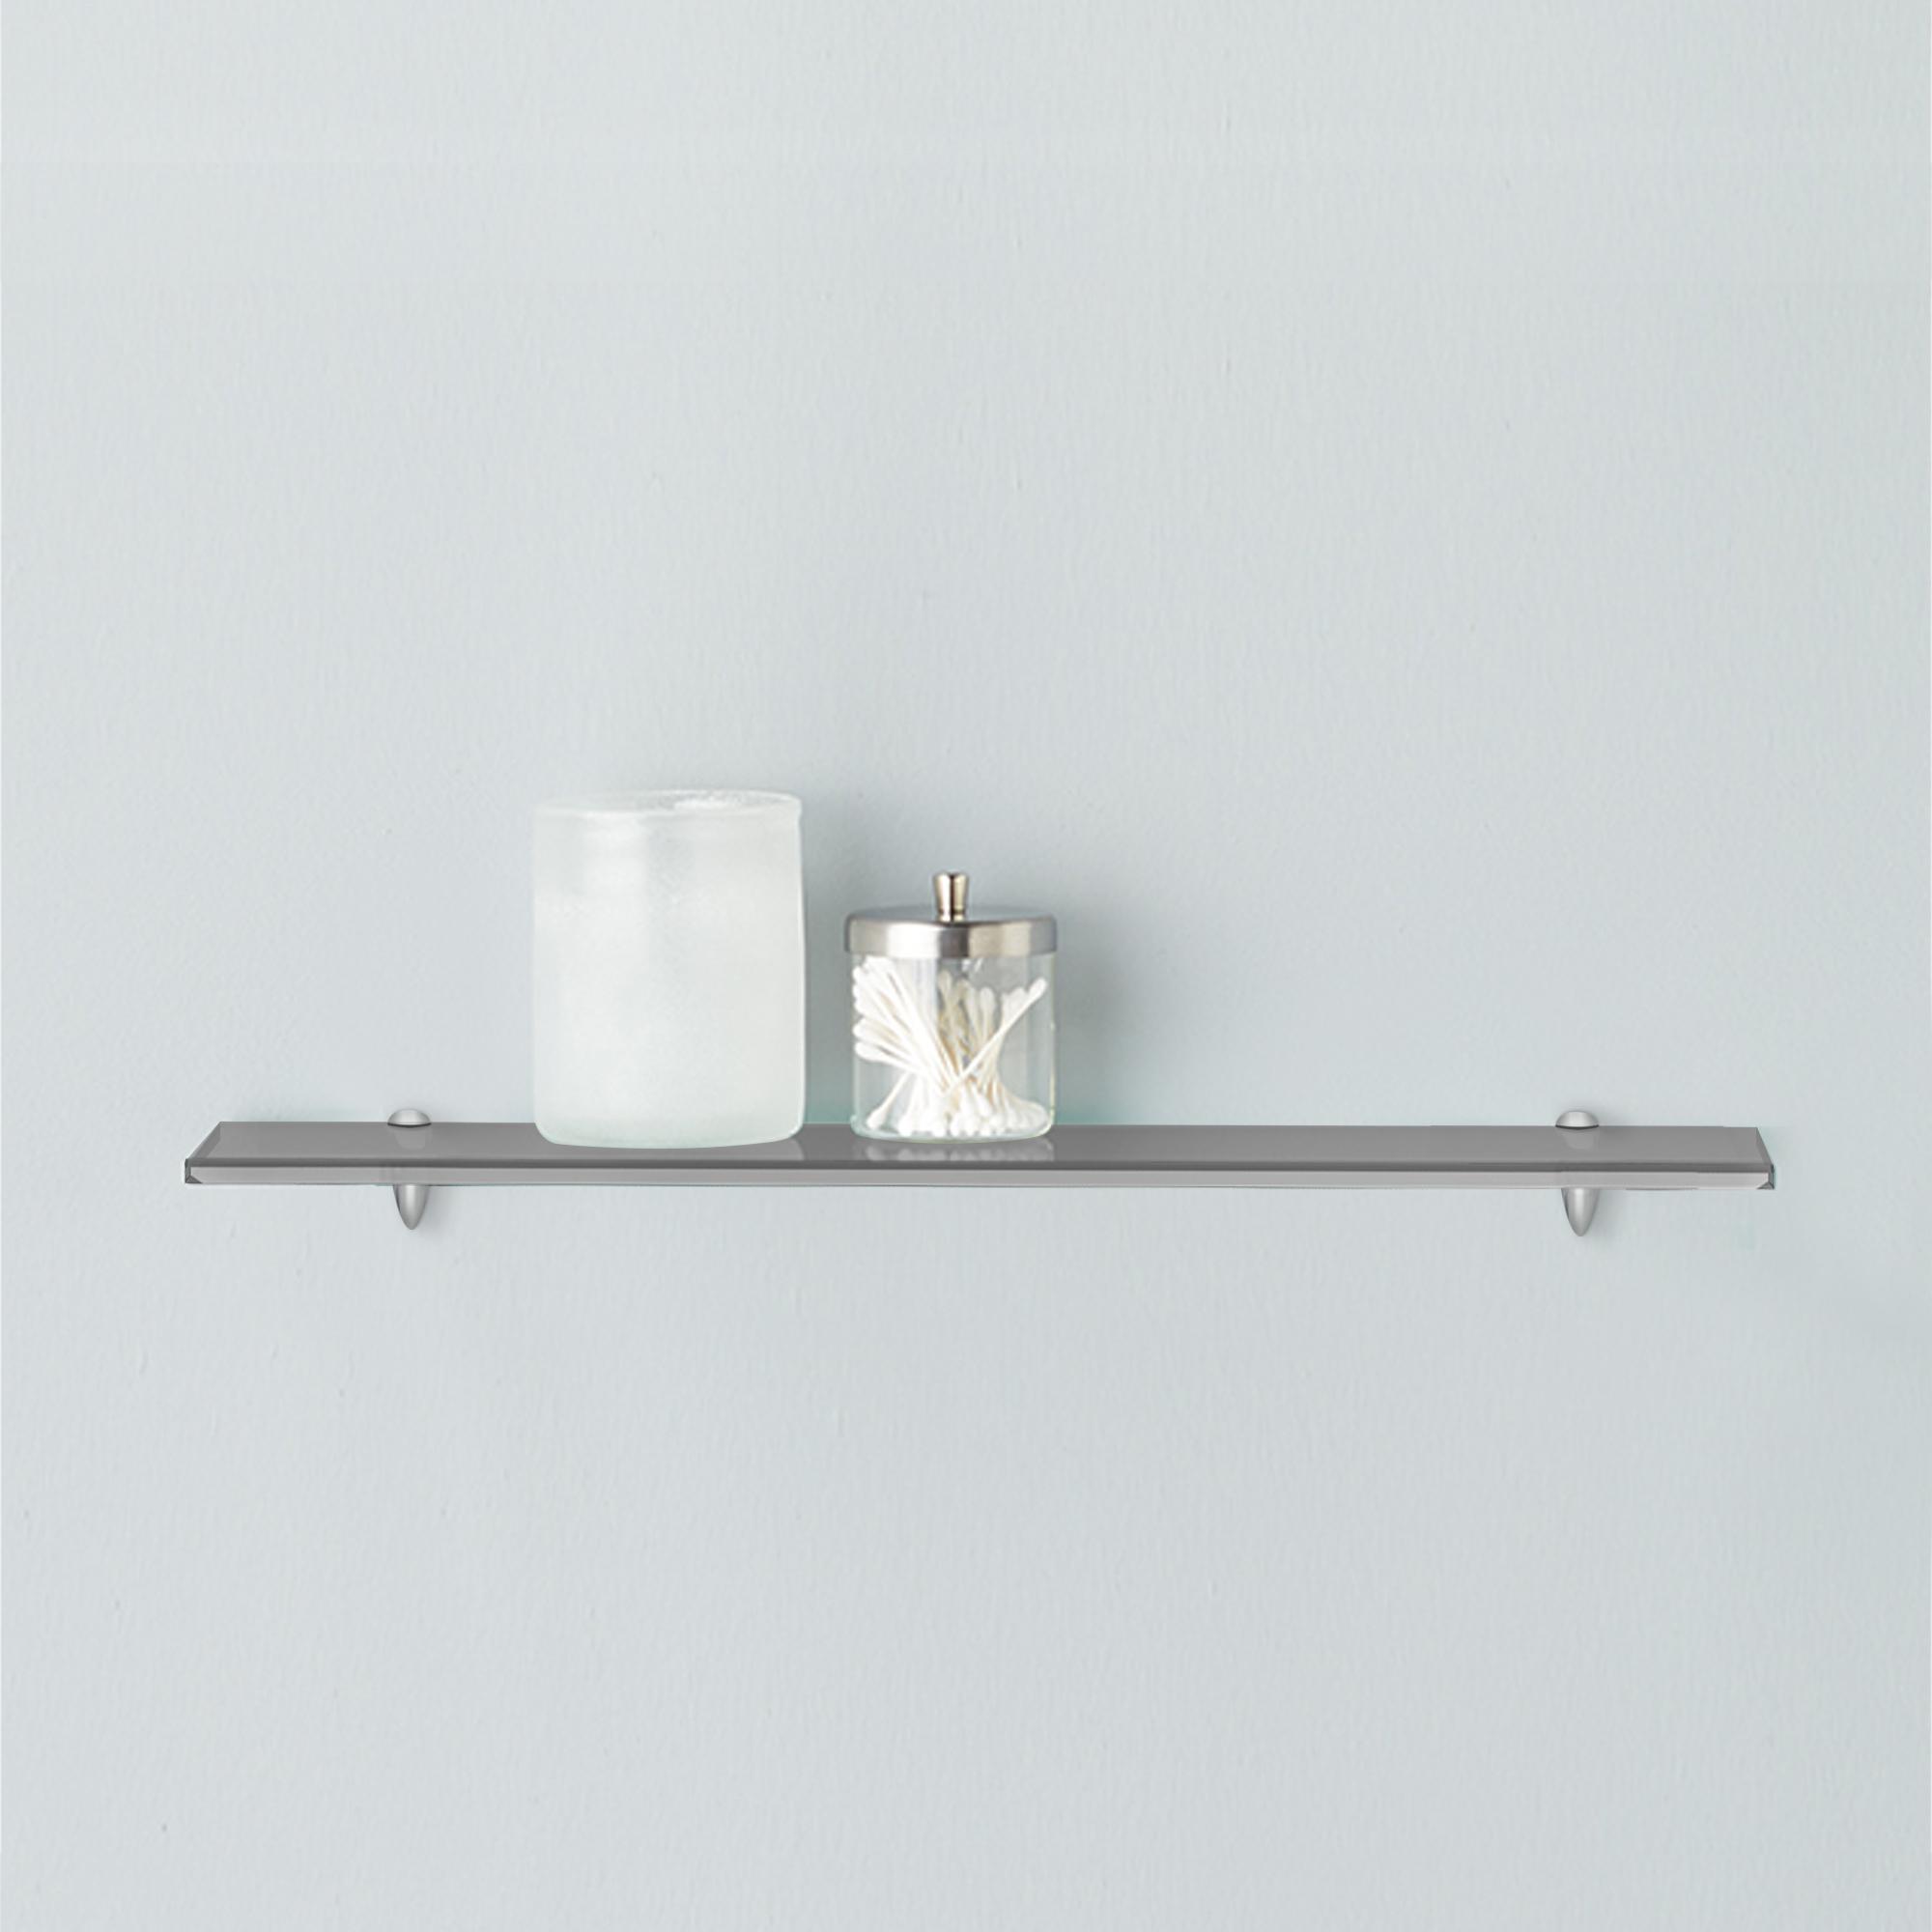 fab glass and mirror rectangle floating grey glass shelf kit w chrome brackets ebay. Black Bedroom Furniture Sets. Home Design Ideas